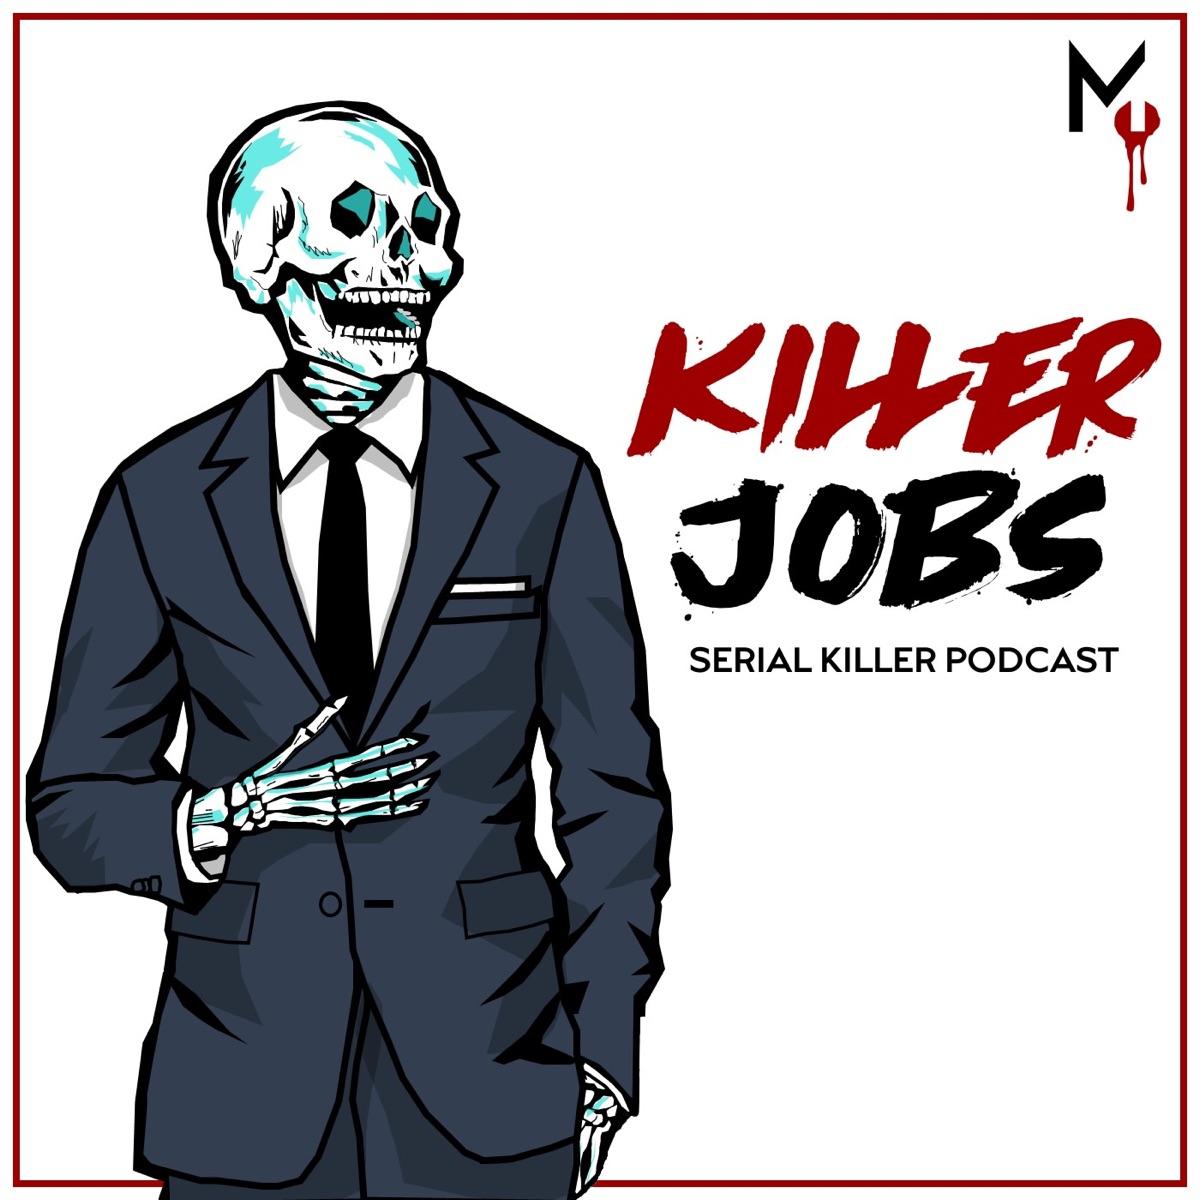 Killer Jobs: Serial Killer Podcast